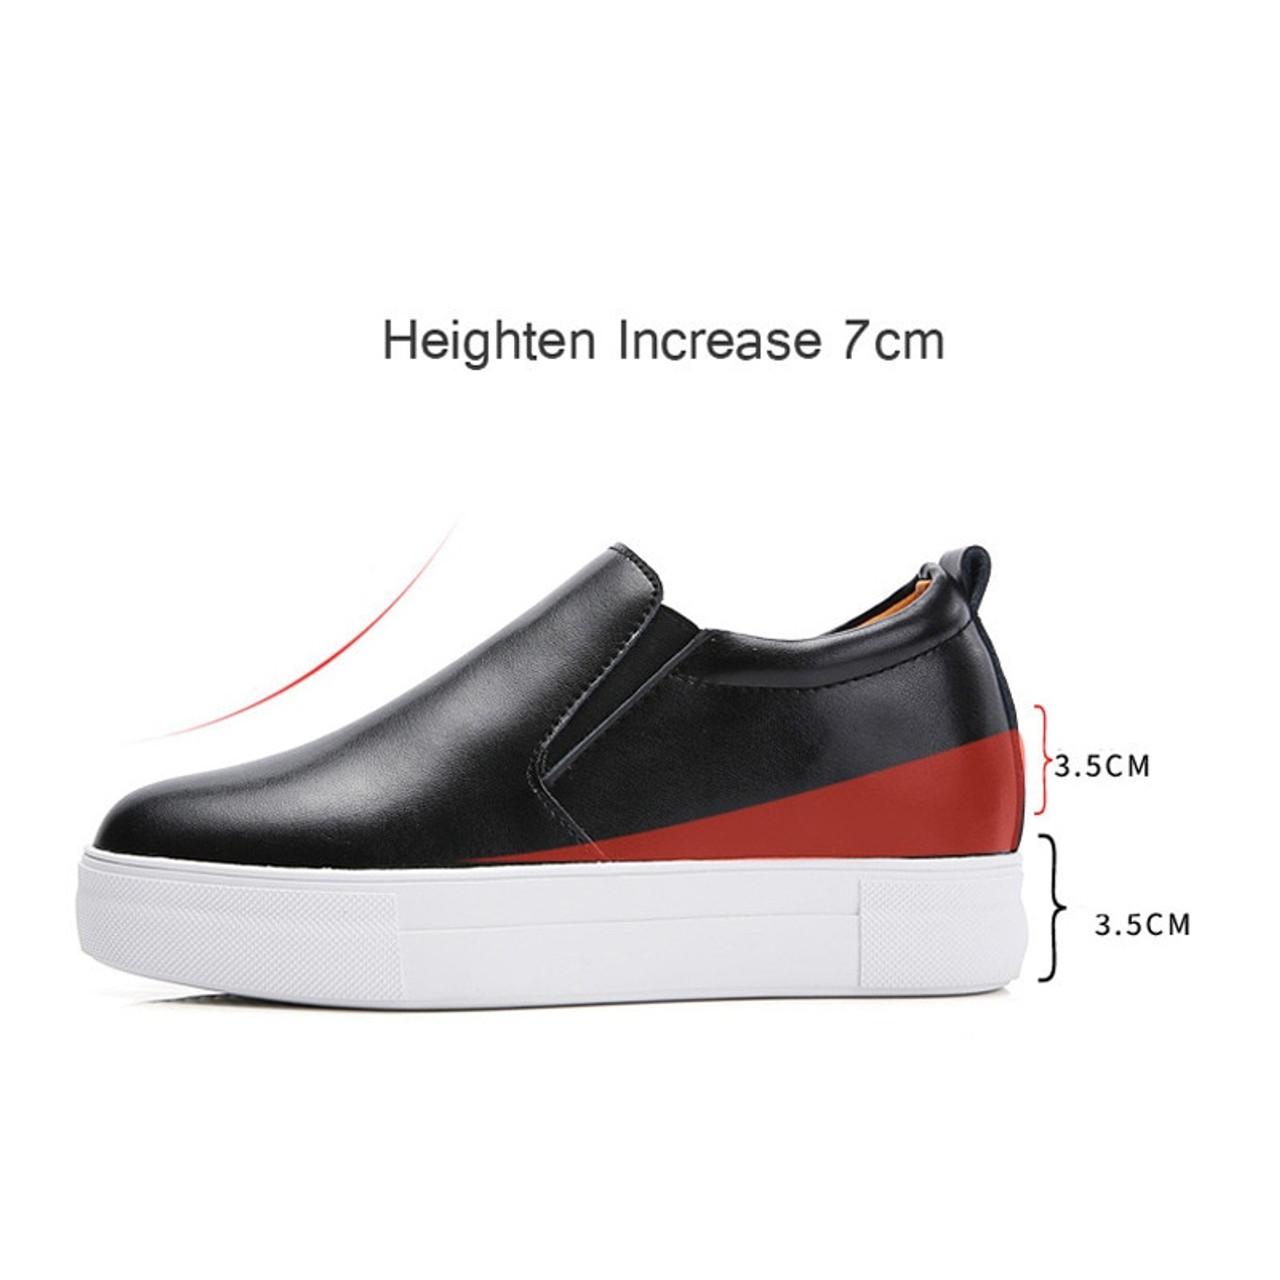 0216c03facd0 ... PINSEN 2018 Autumn Women Flats Shoes Genuine Leather Slip-on Platform  Height Increase Ladies Oxfords ...